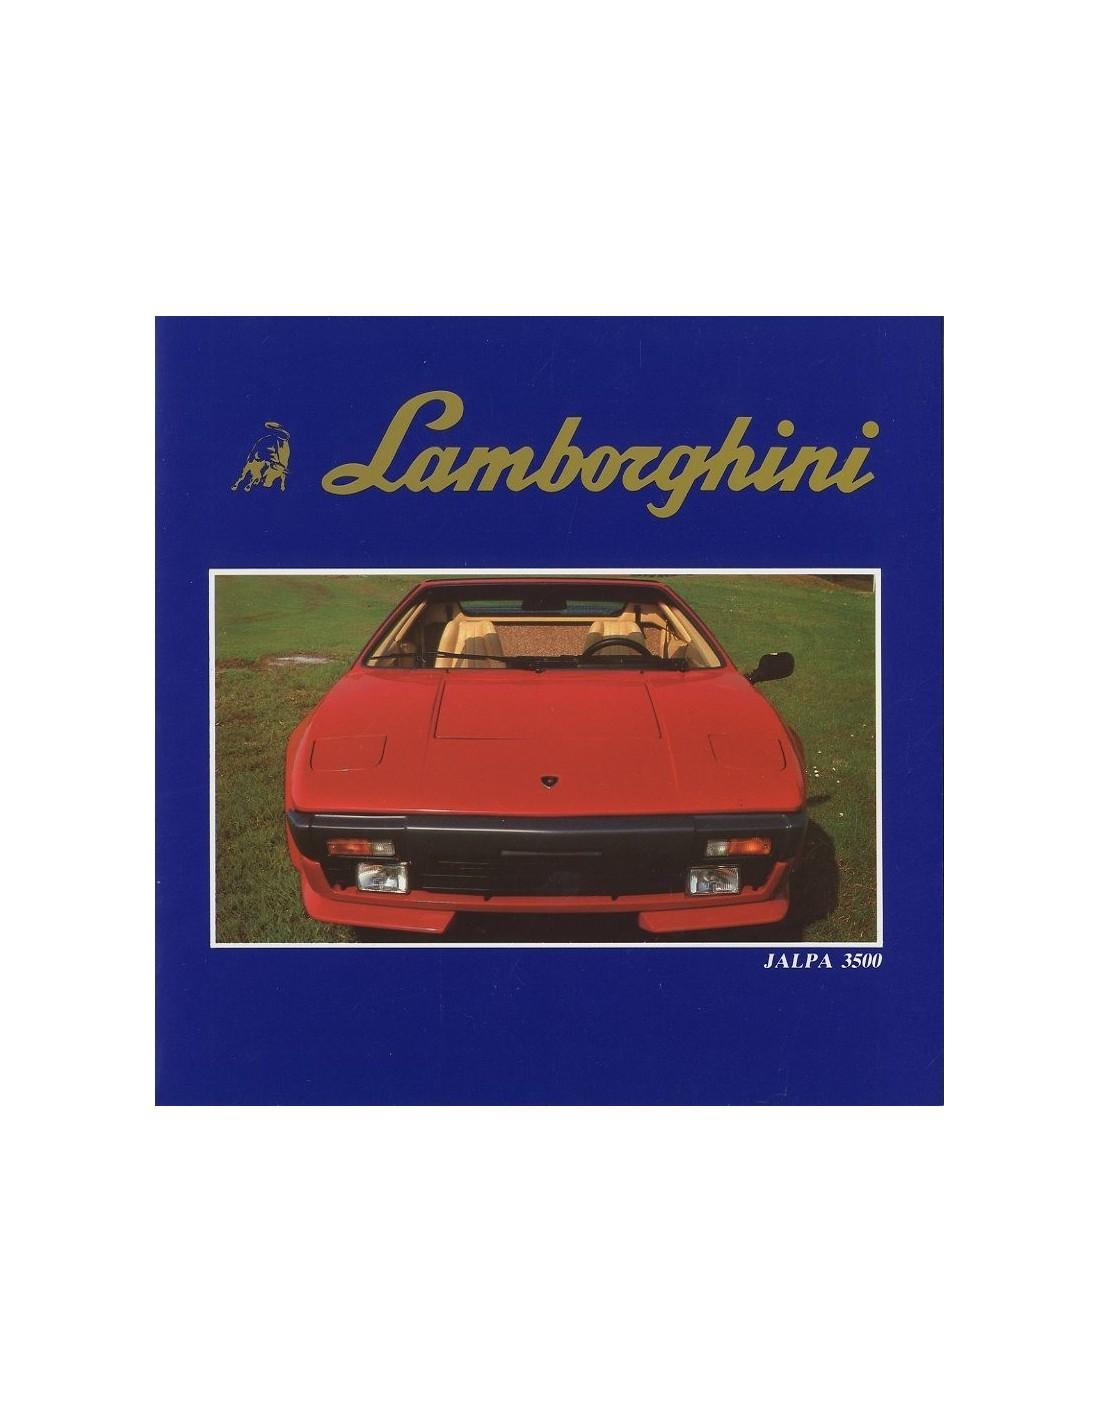 https://www.autolit.eu/5504-thickbox_default/1981-lamborghini-jalpa-3500-brochure.jpg